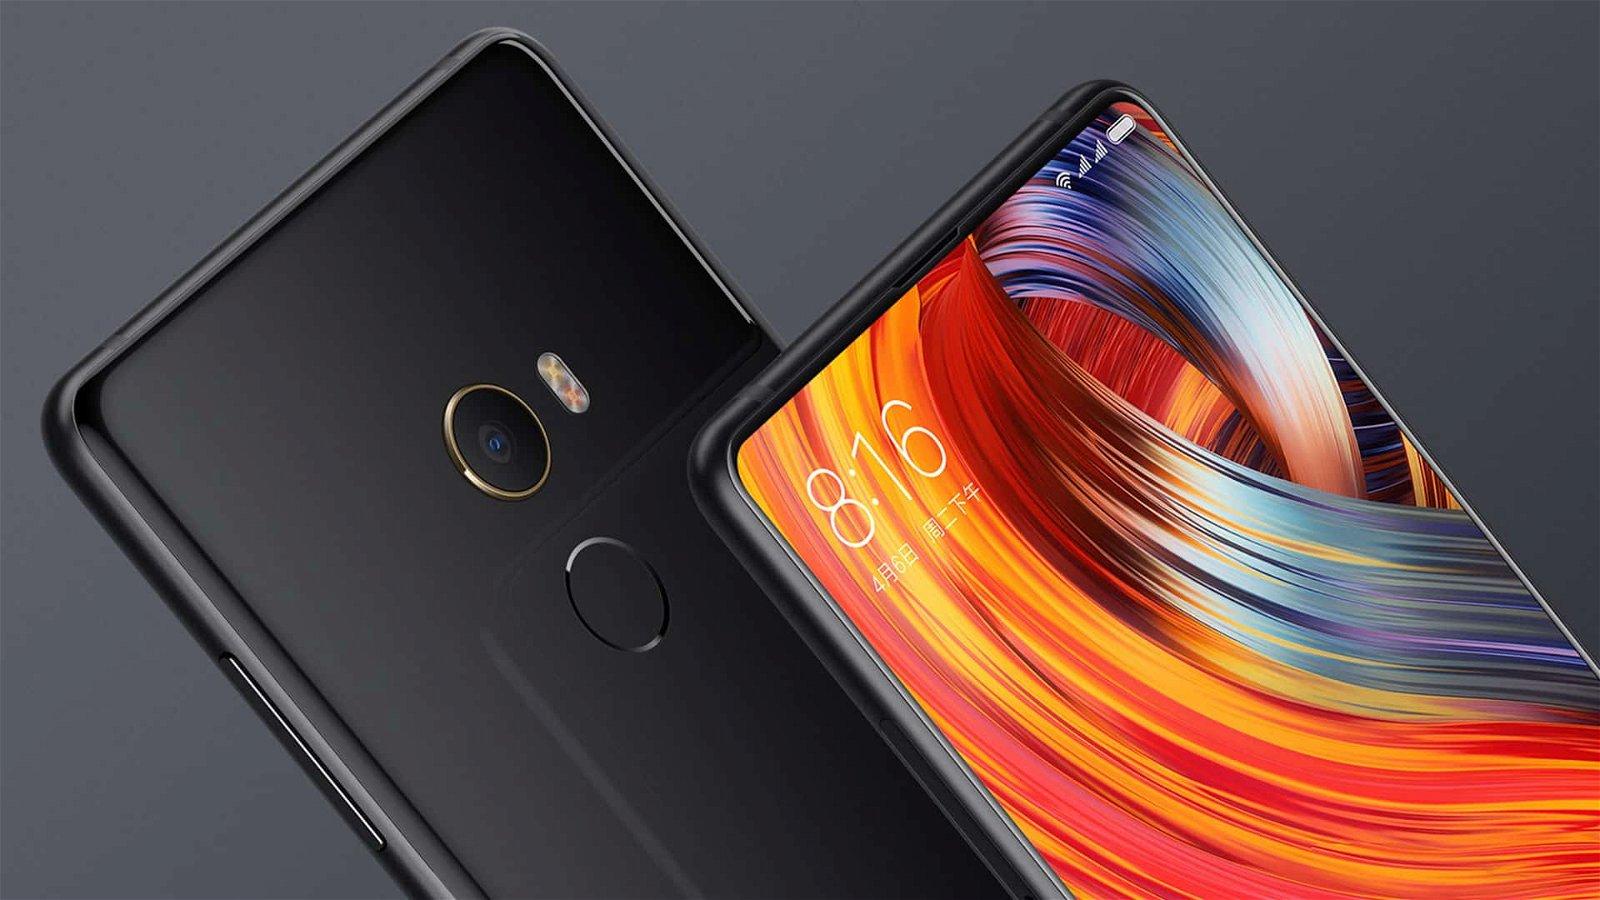 Xiaomi Mi Mix 2S (Smartphone) Review 12